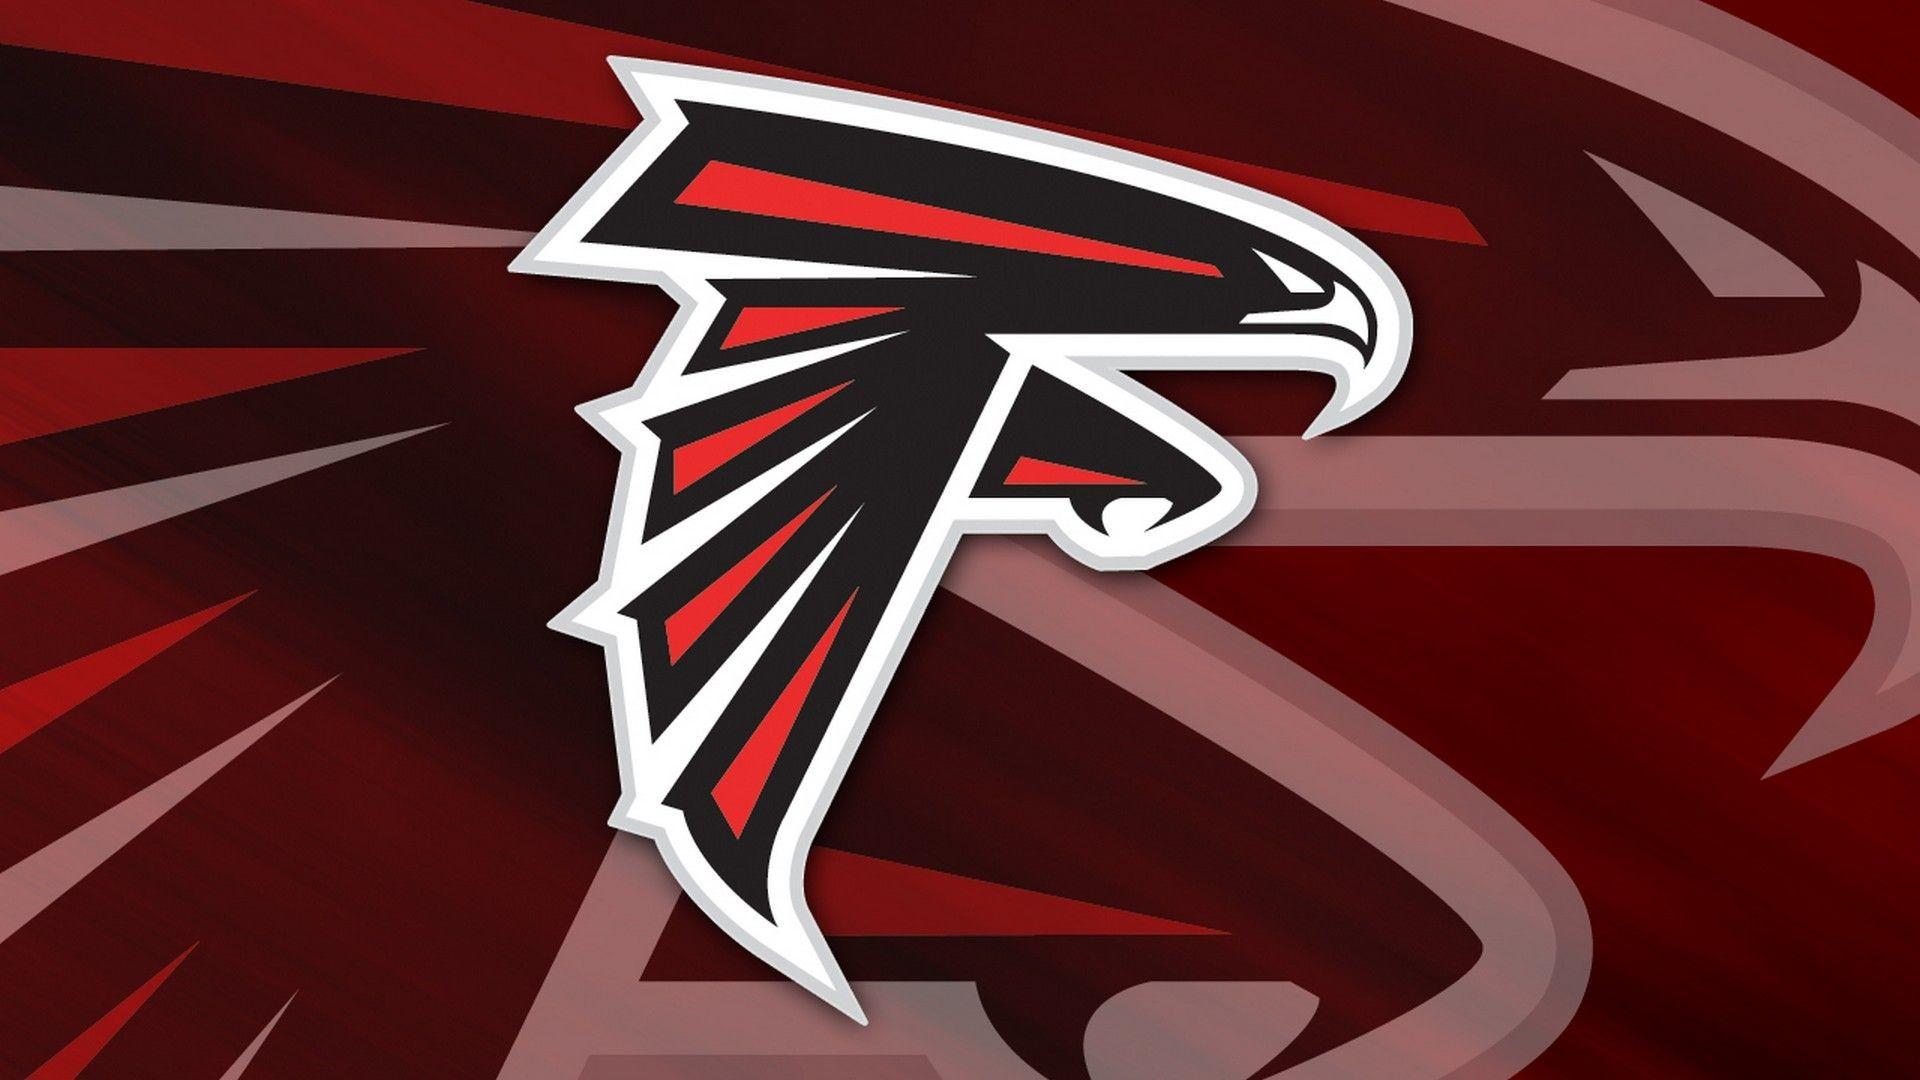 Hd Atlanta Falcons Wallpapers: Atlanta Falcons Wallpaper 2018 (82+ Images